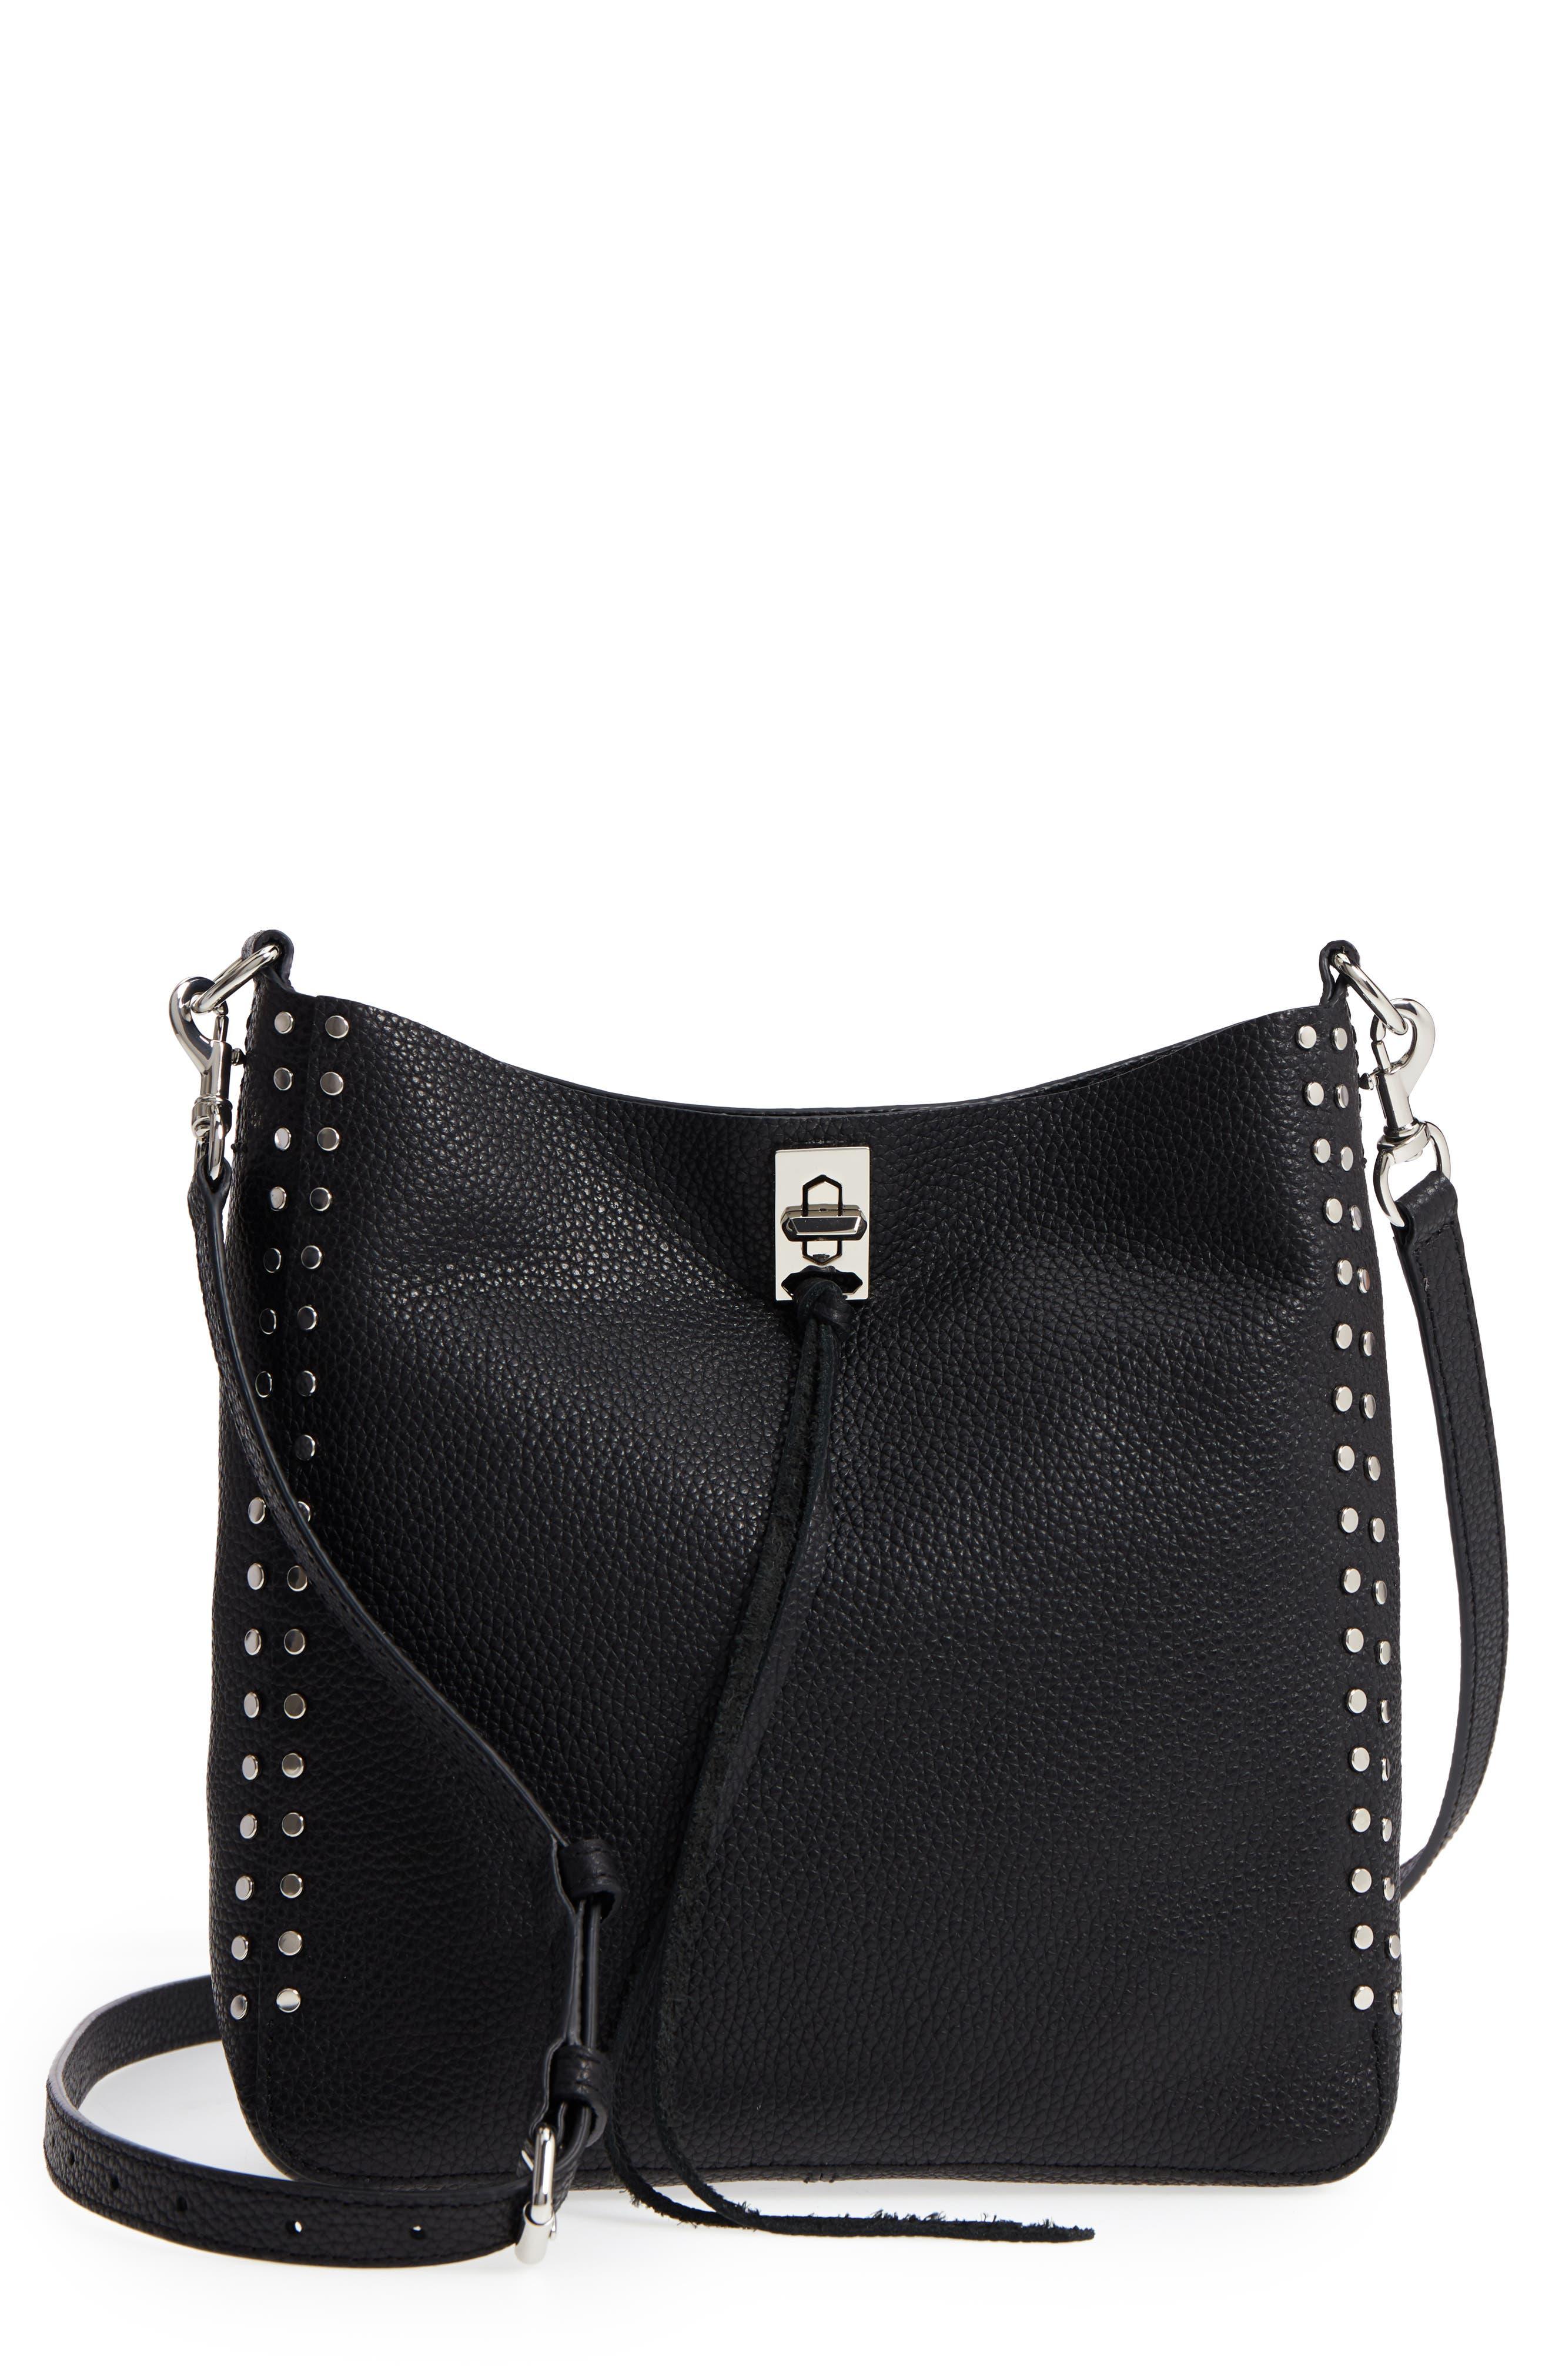 REBECCA MINKOFF Small Darren Leather Feed Bag, Main, color, 001